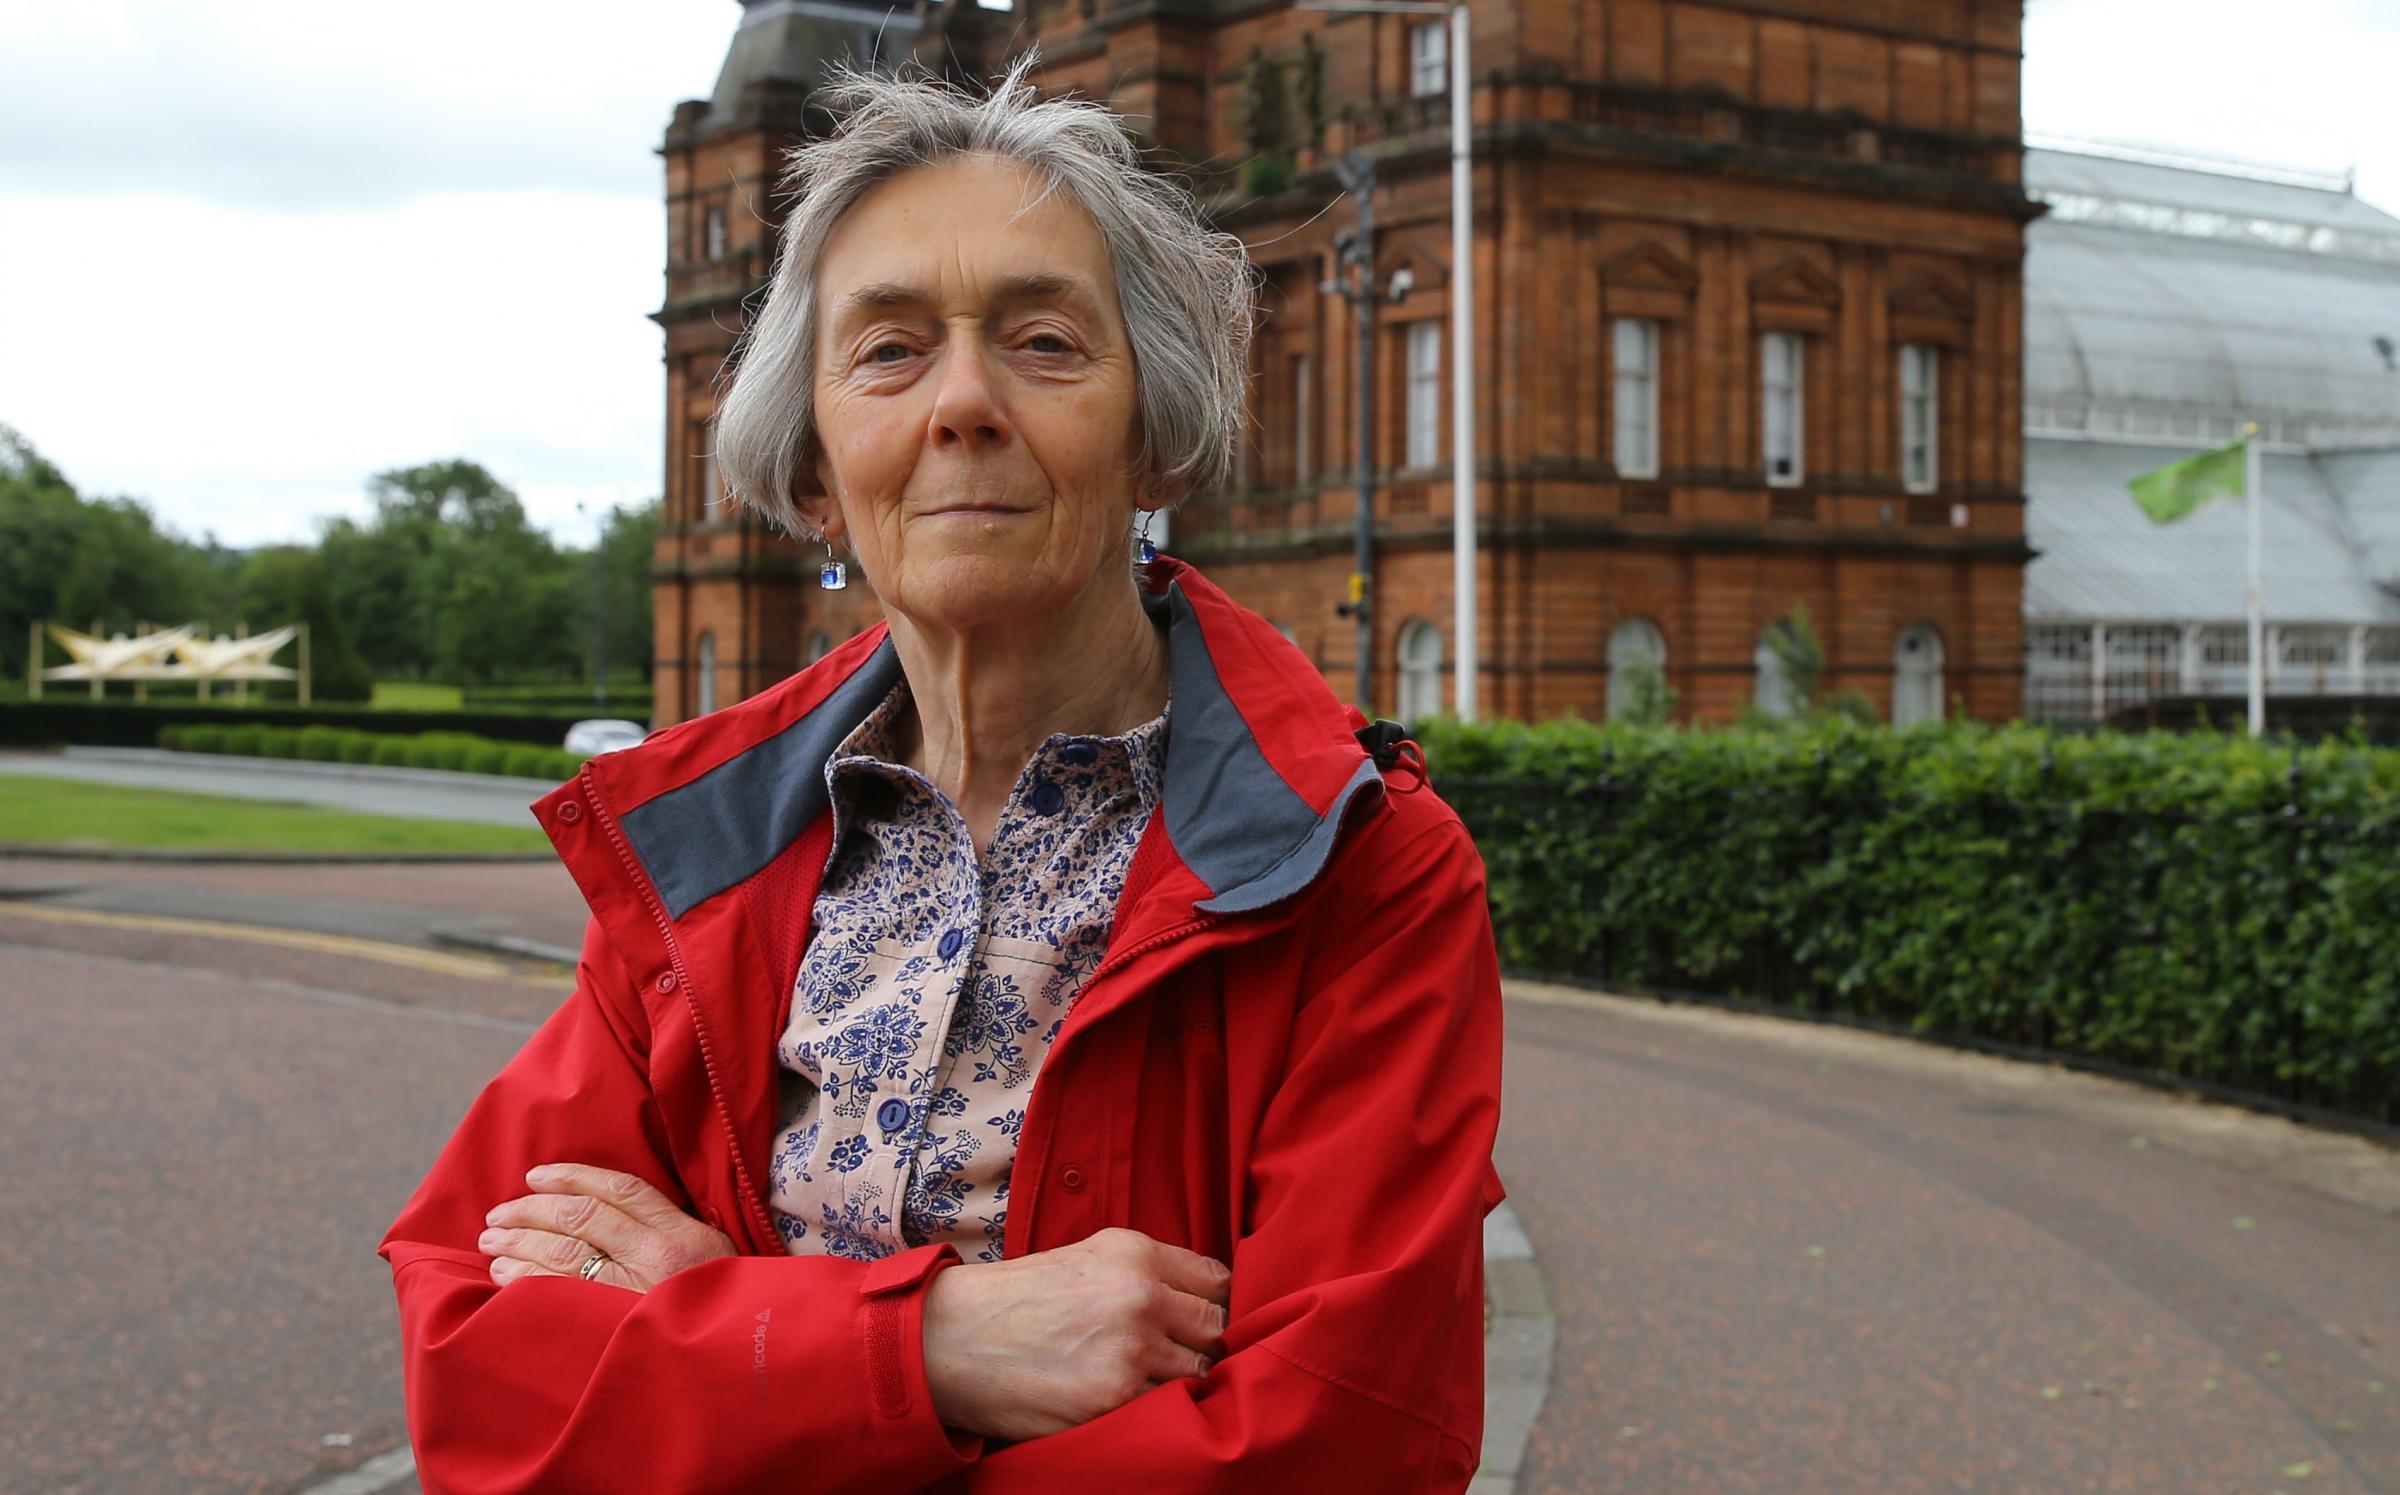 Woman in plea for more public toilets in Glasgow